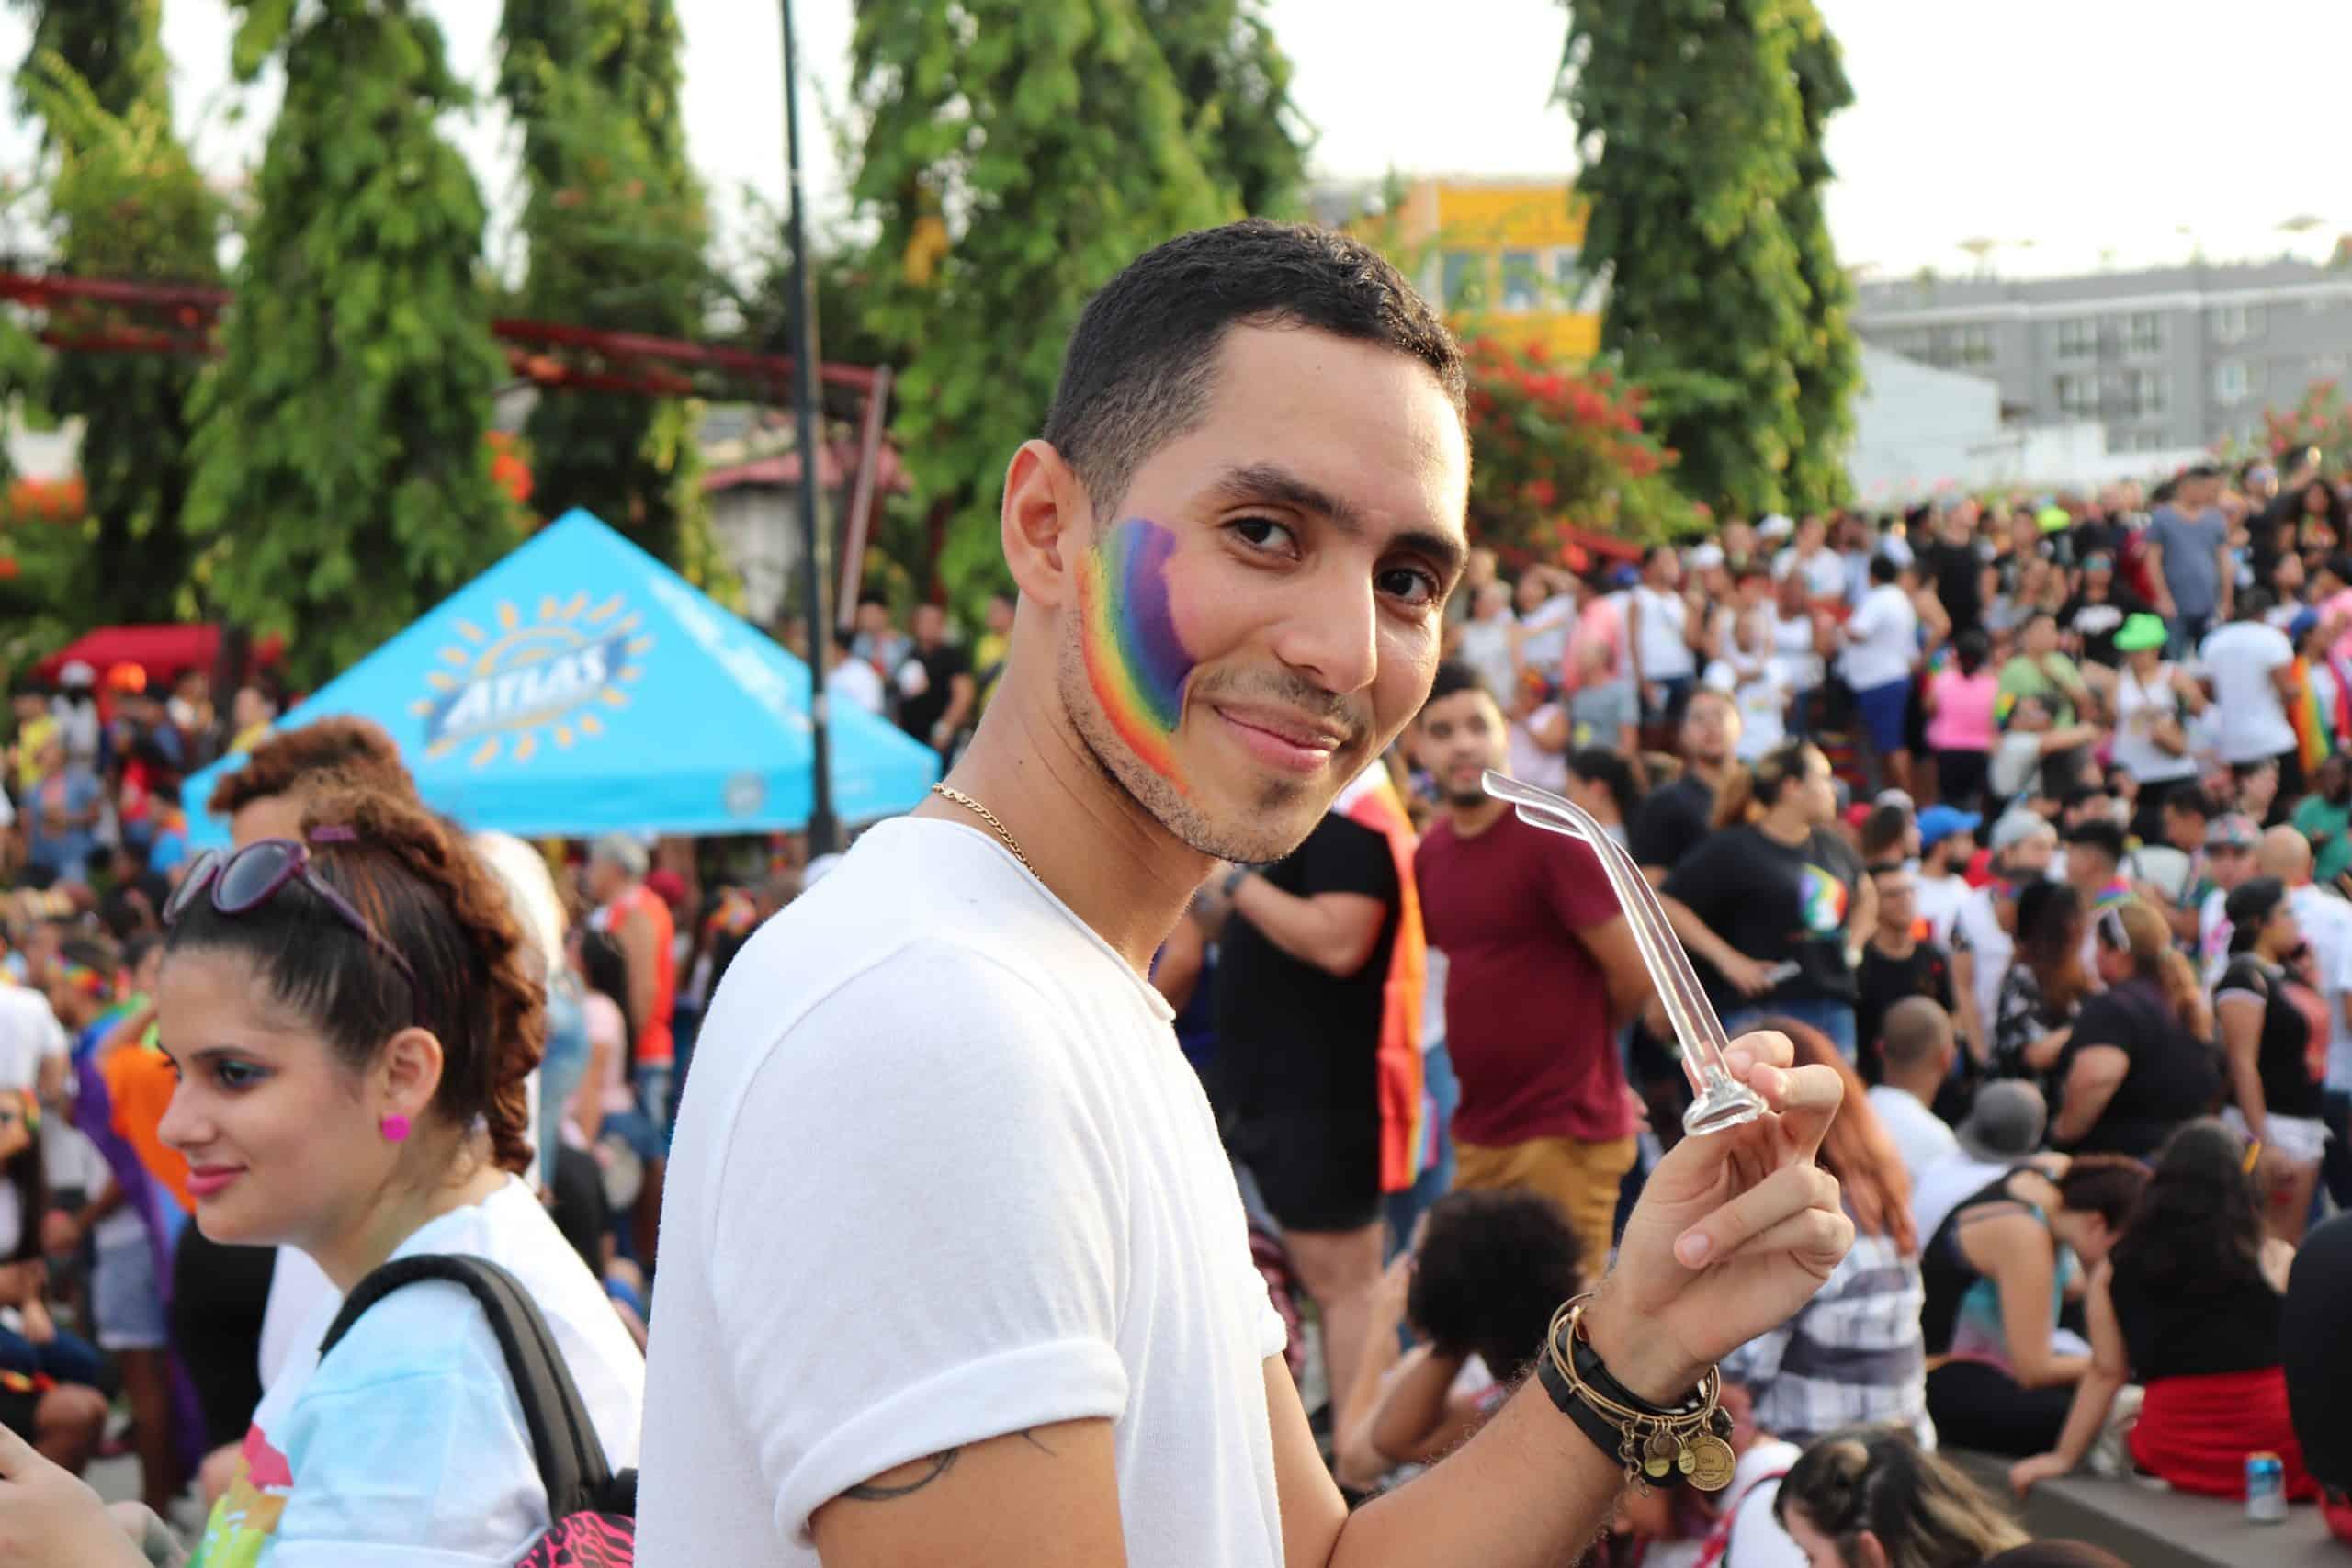 Man smiling at Pride event